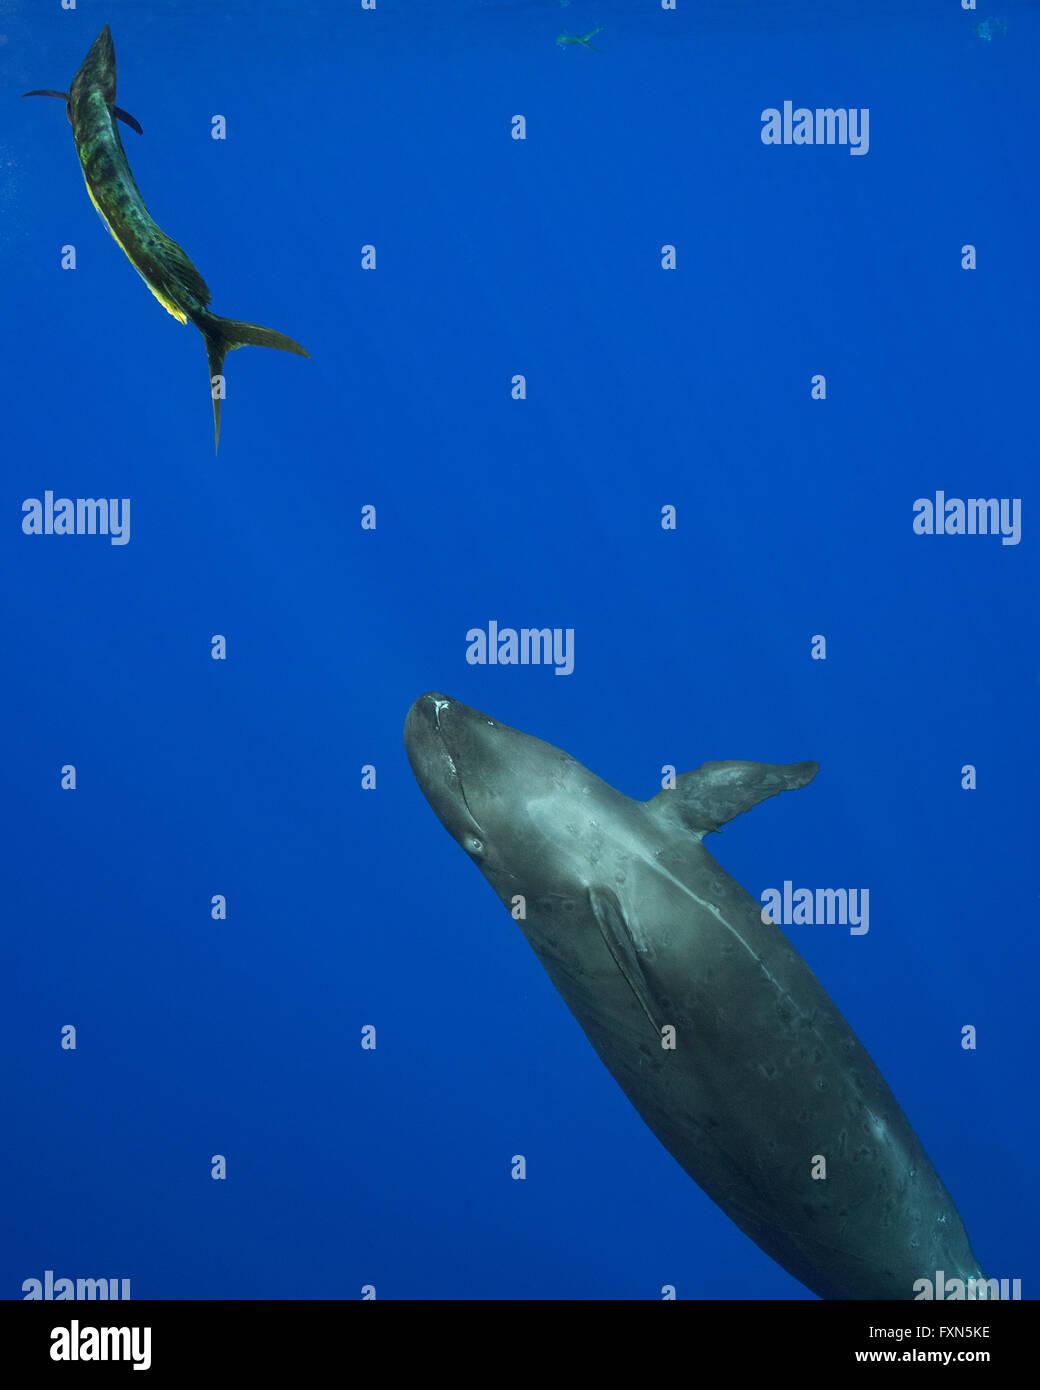 Pseudorca, ou fausse orque, Pseudorca crassidens, poursuivant peur dorado, mahi-mahi, mahi-mahi, mahi-mahi, ou Dolphin Photo Stock